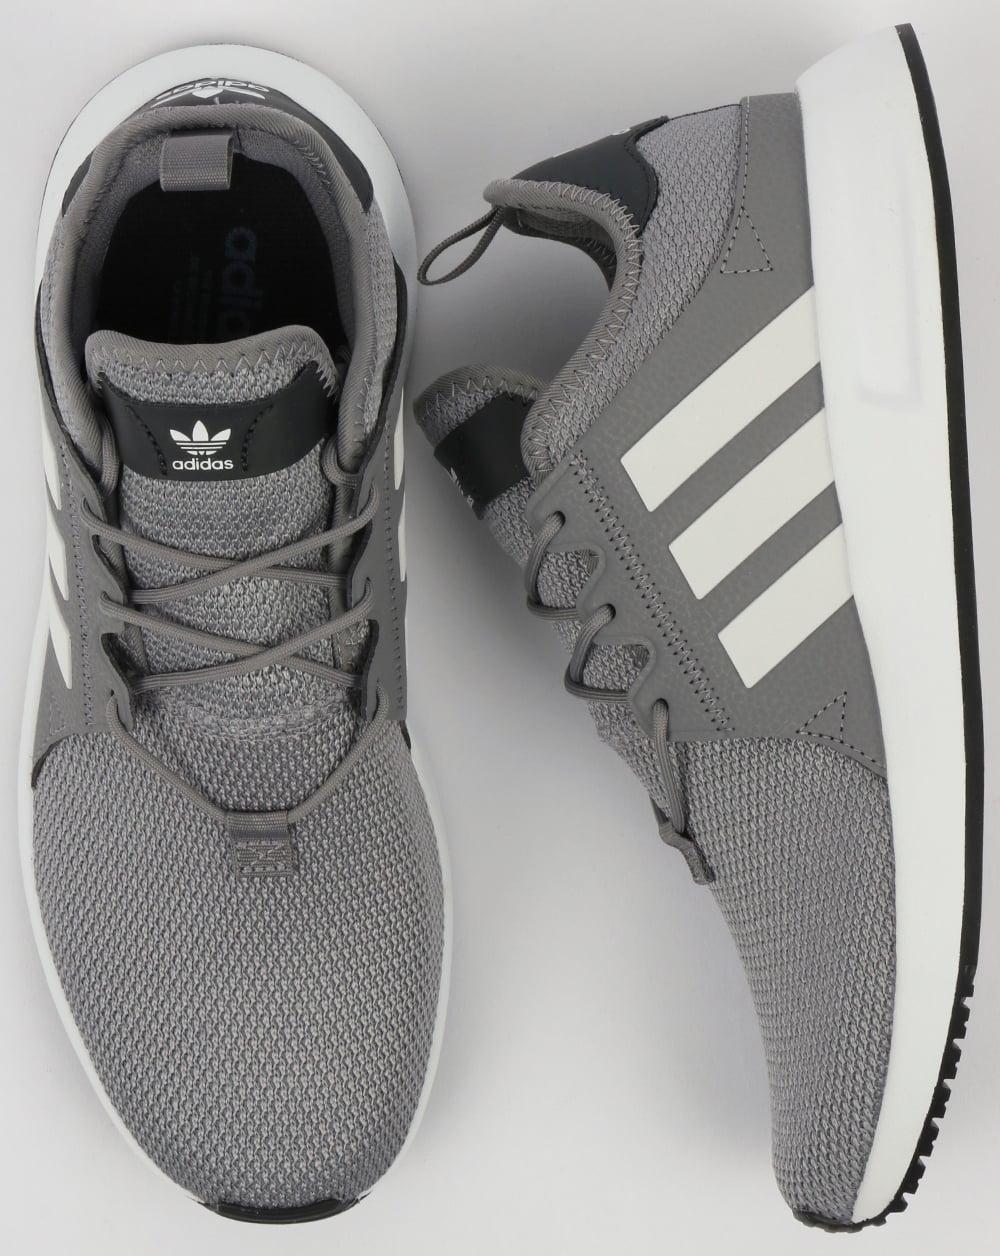 Adidas XPLR Trainers Grey,white,carbon